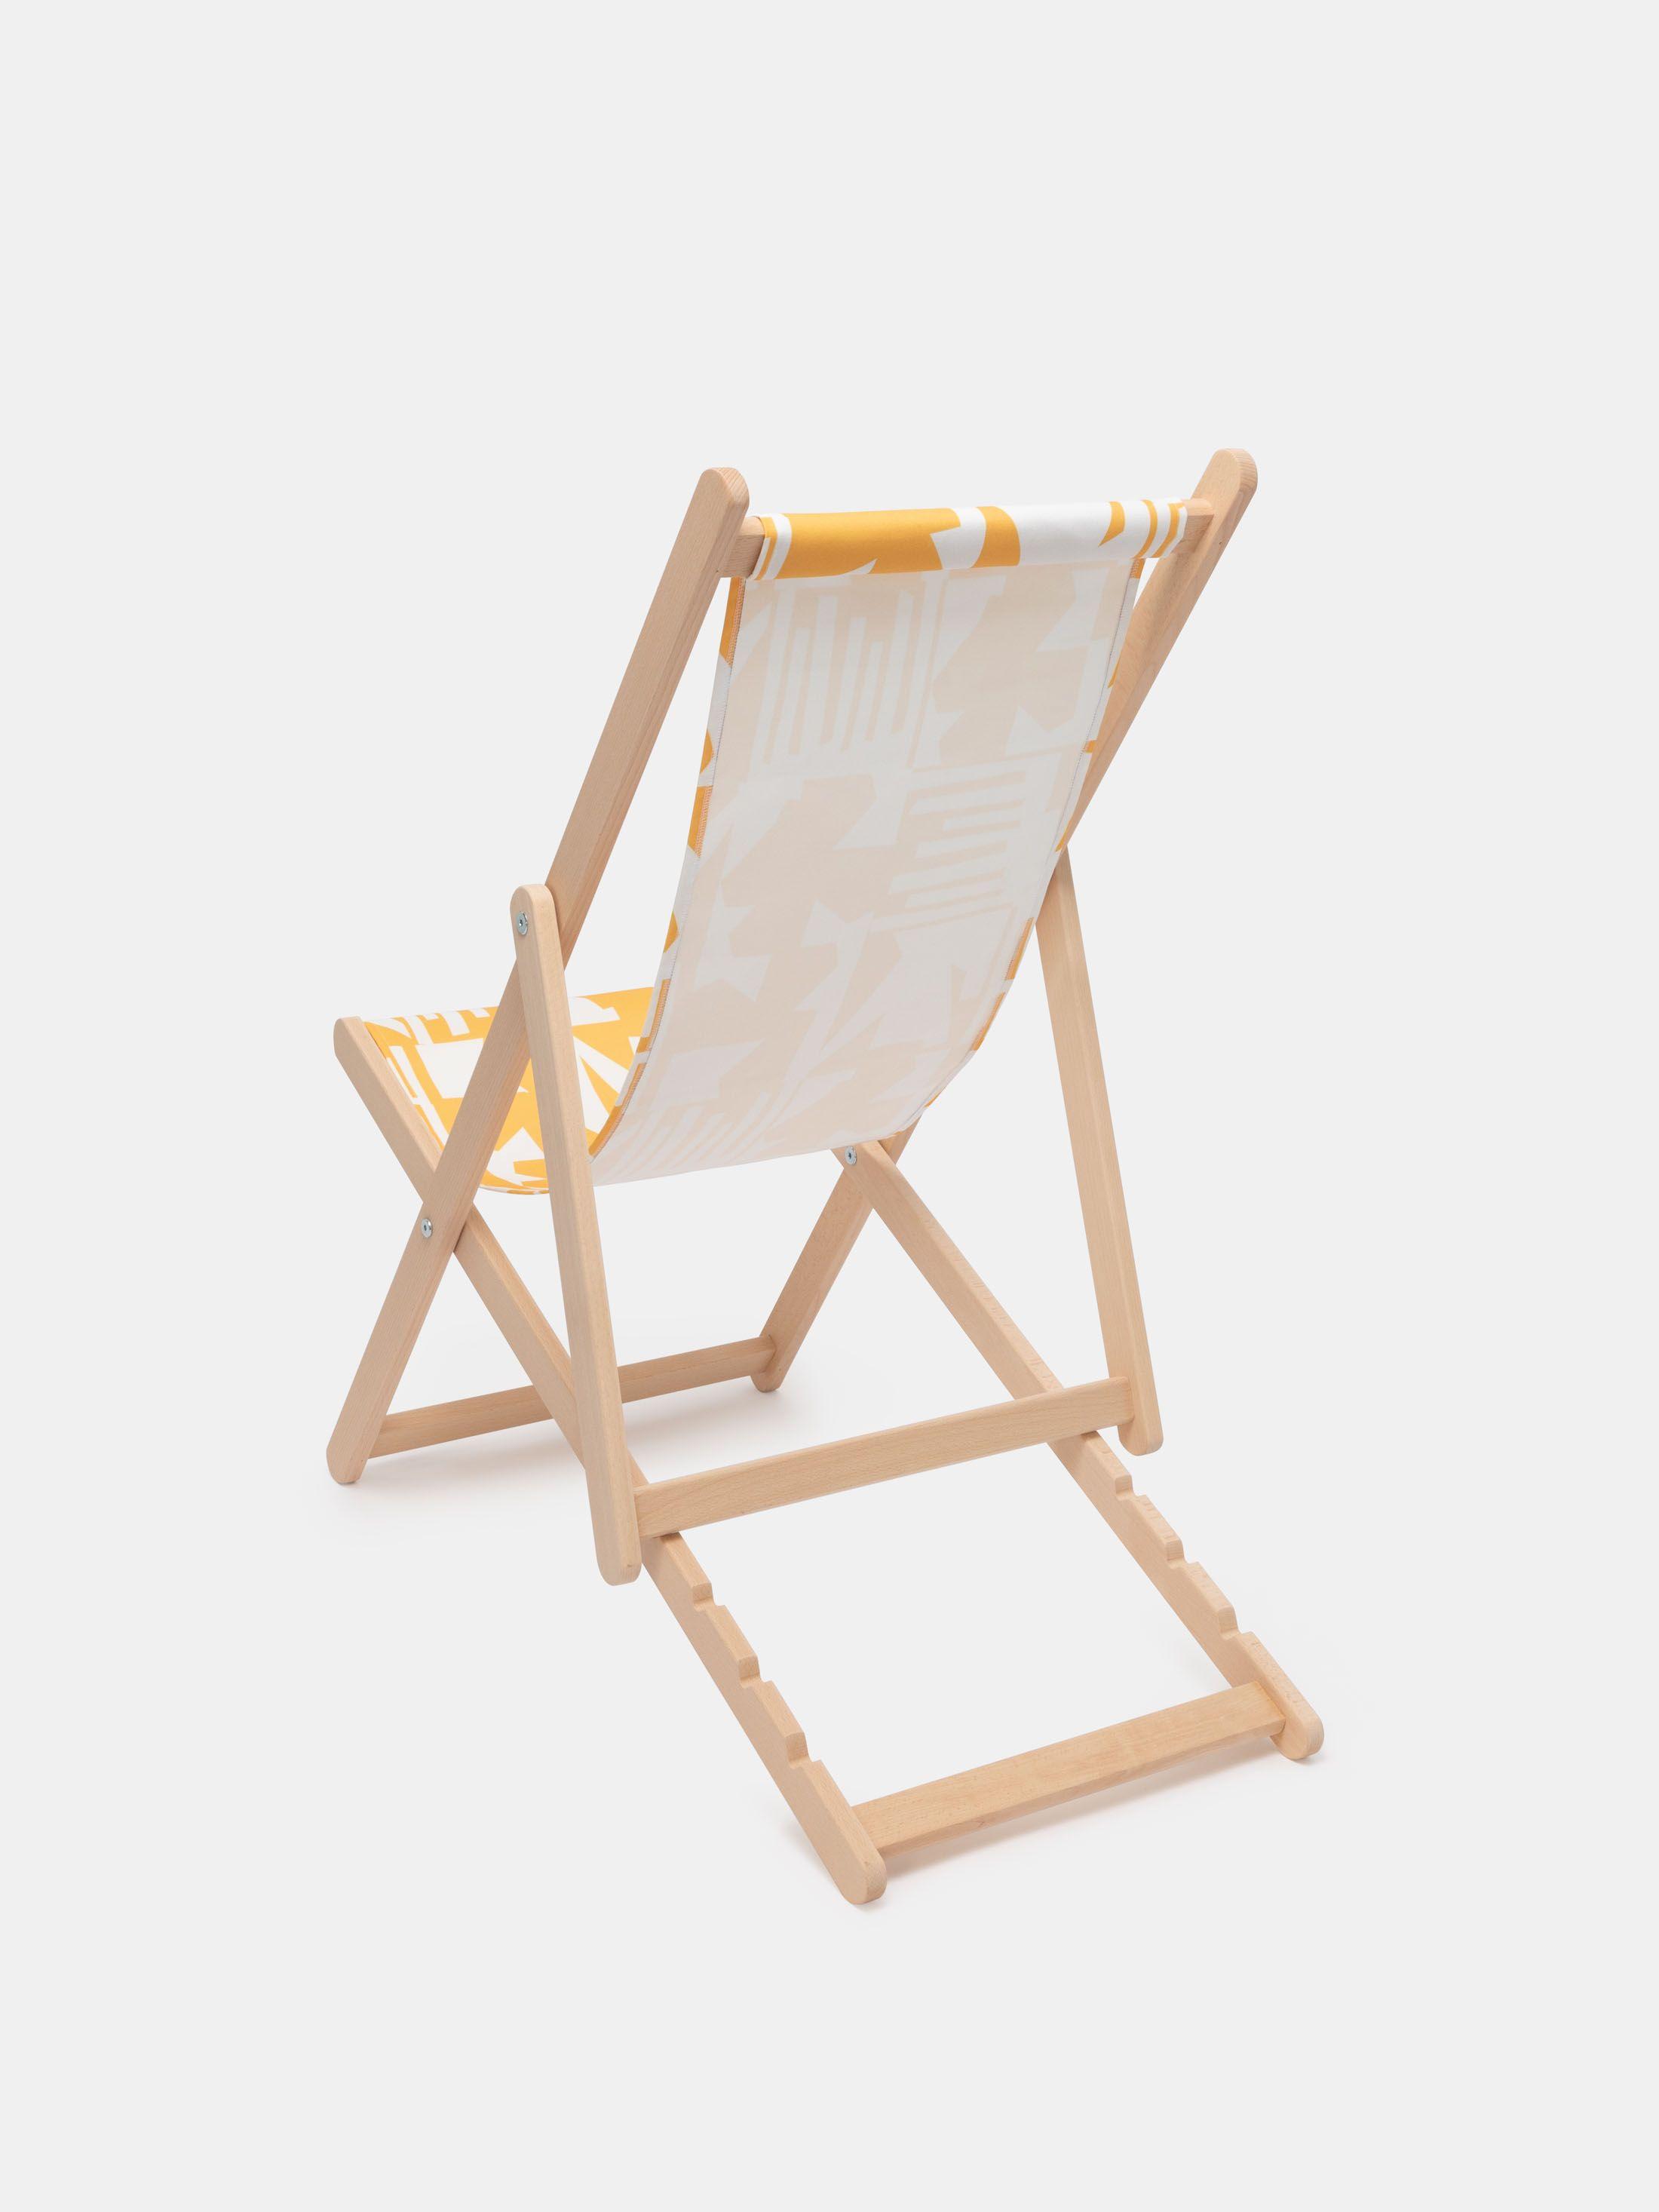 customised deckchairs